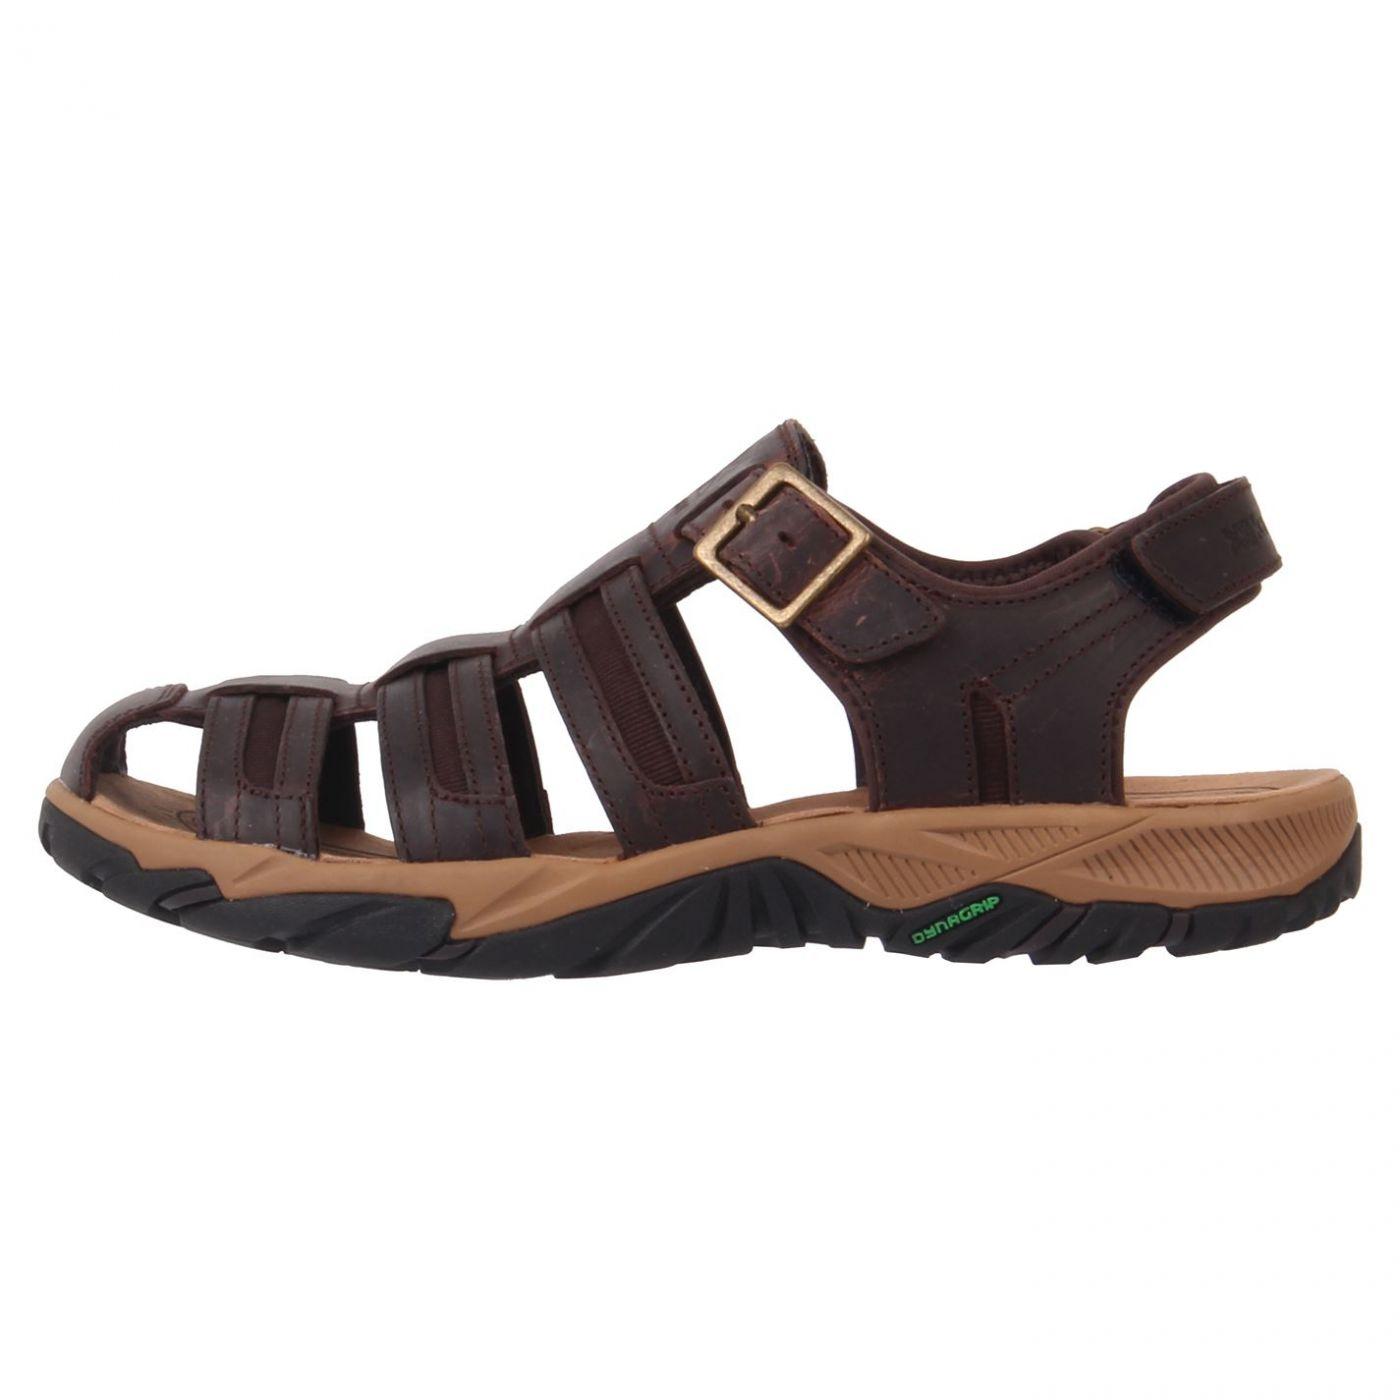 Karrimor Fisherman Mens Sandals